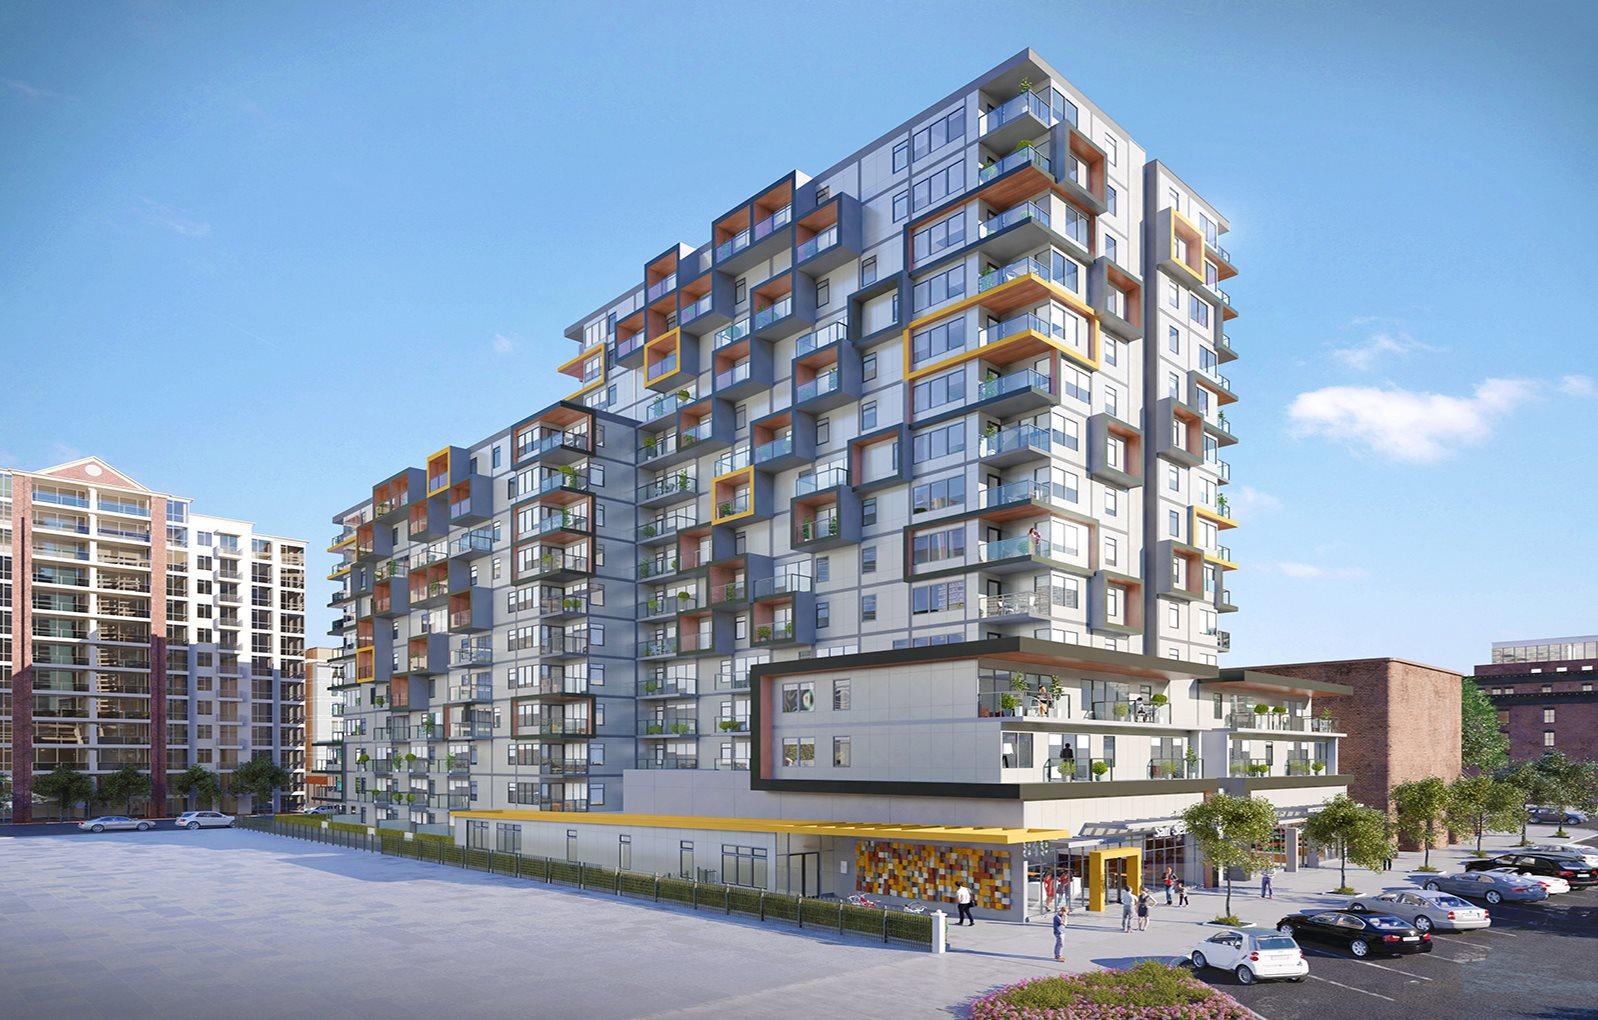 Astounding Yello On Yates Apartments In Victoria Bc Download Free Architecture Designs Scobabritishbridgeorg